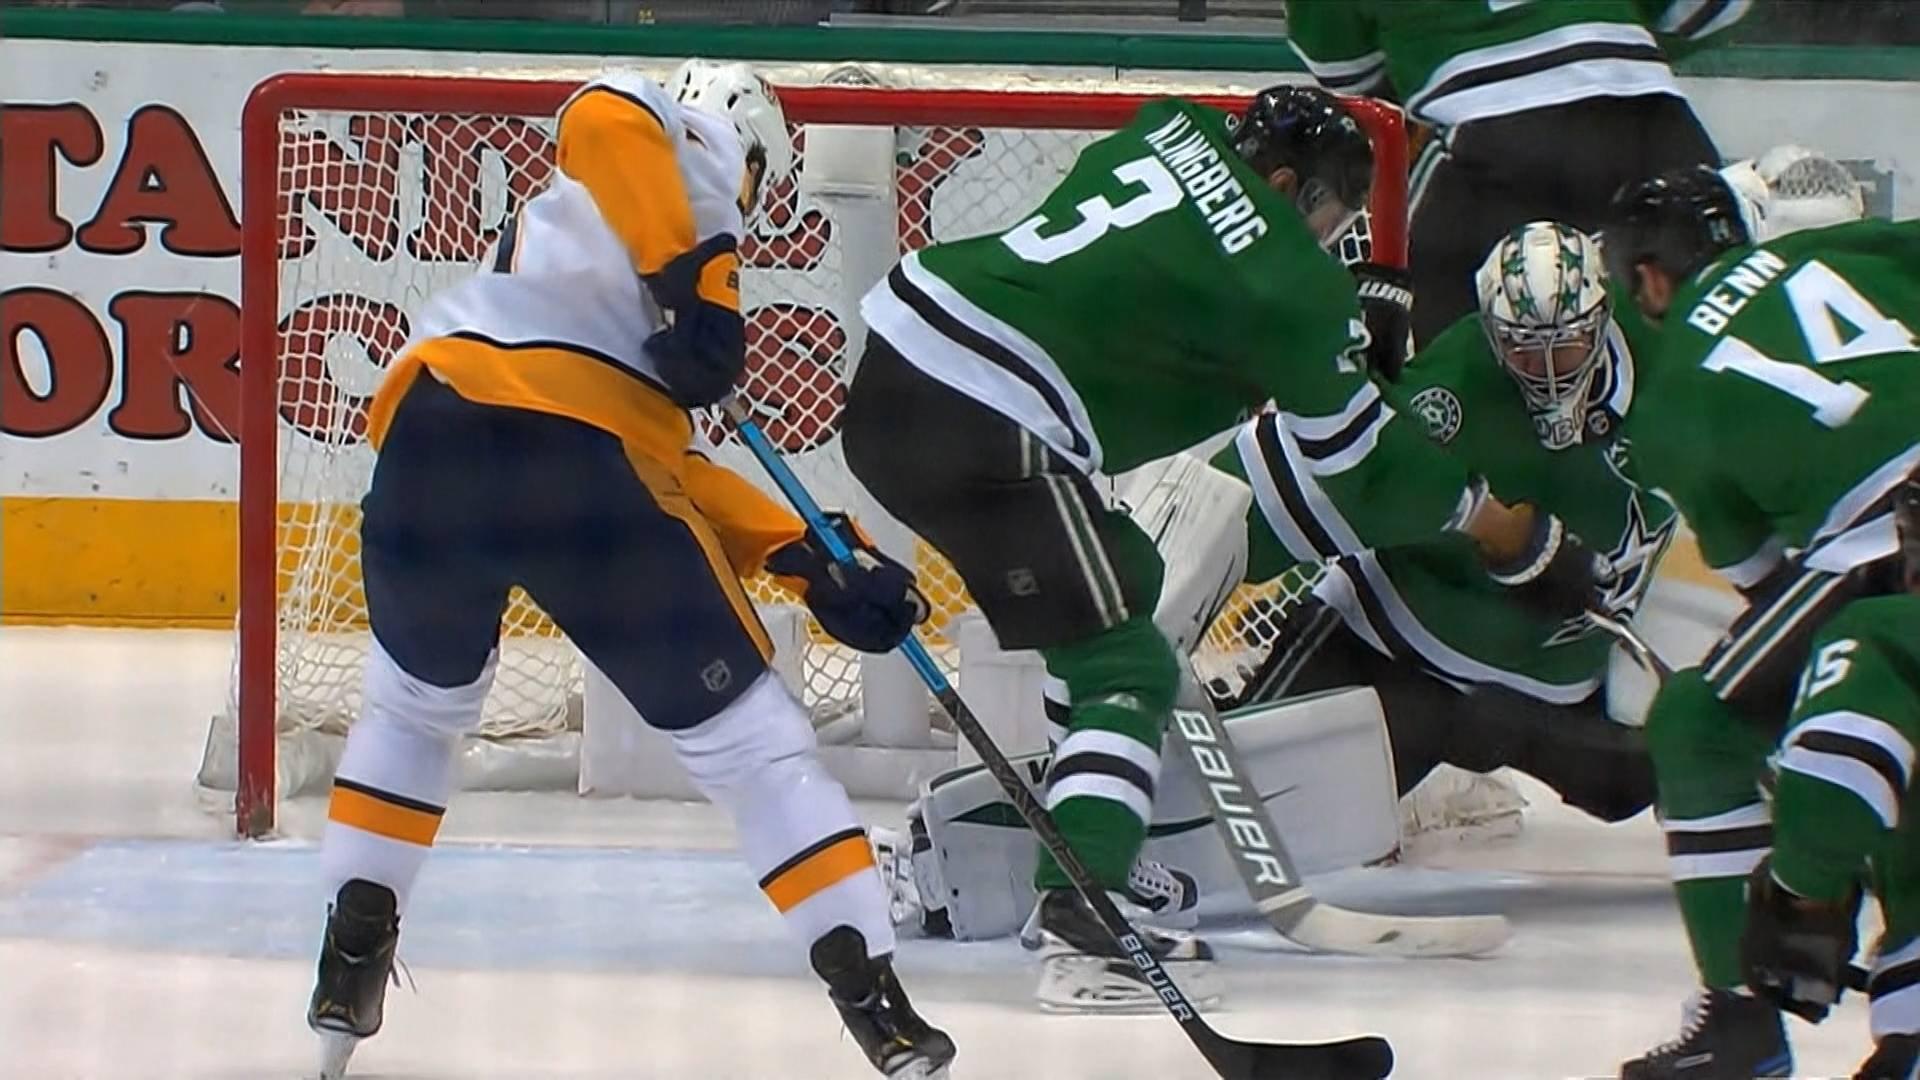 NHL VOD FEED WILL_3380 11163_H_14367_20190220_164026.jpg